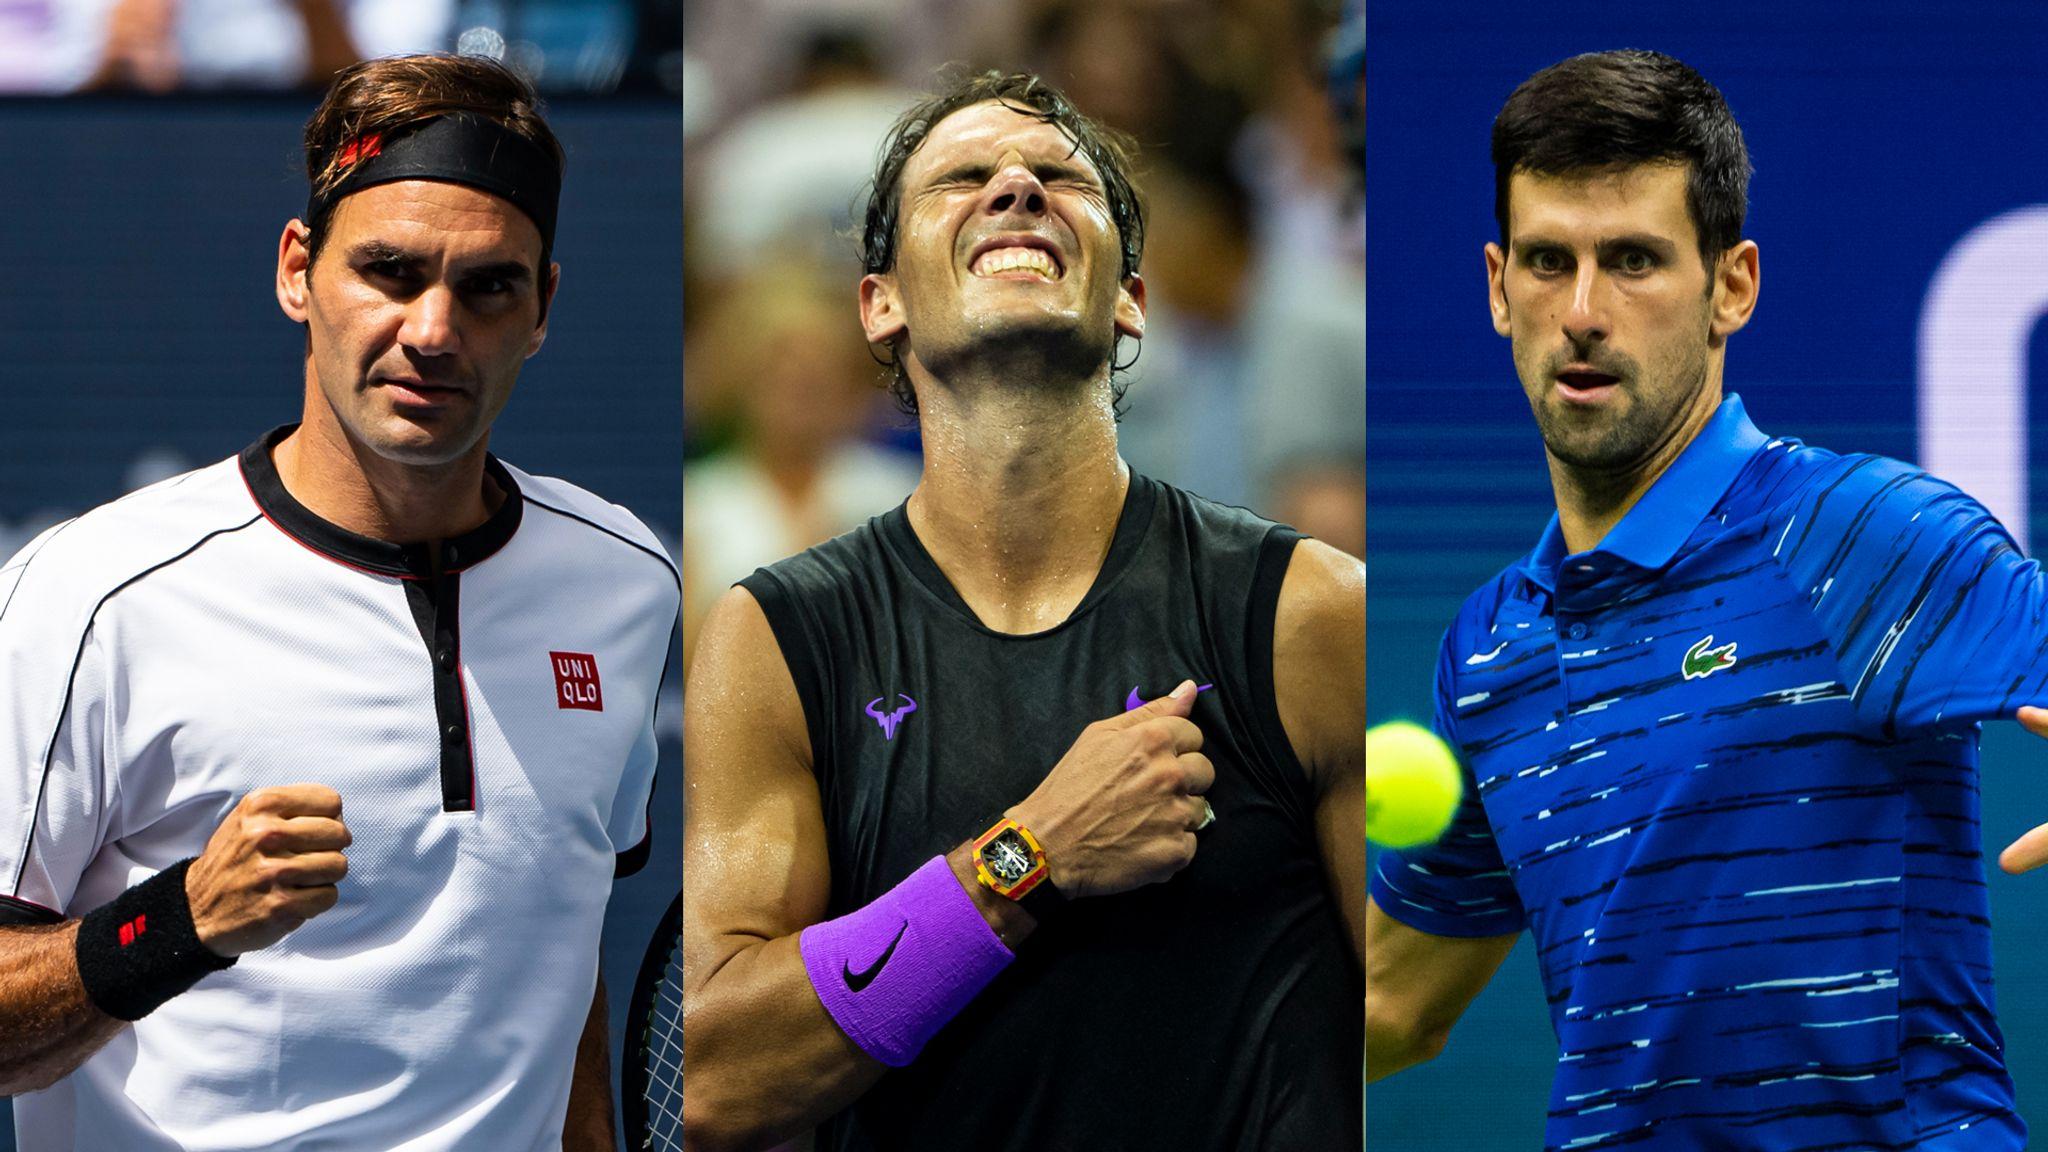 Will Roger Federer Rafael Nadal Or Novak Djokovic Win The Most Grand Slam Titles Tennis News Sky Sports